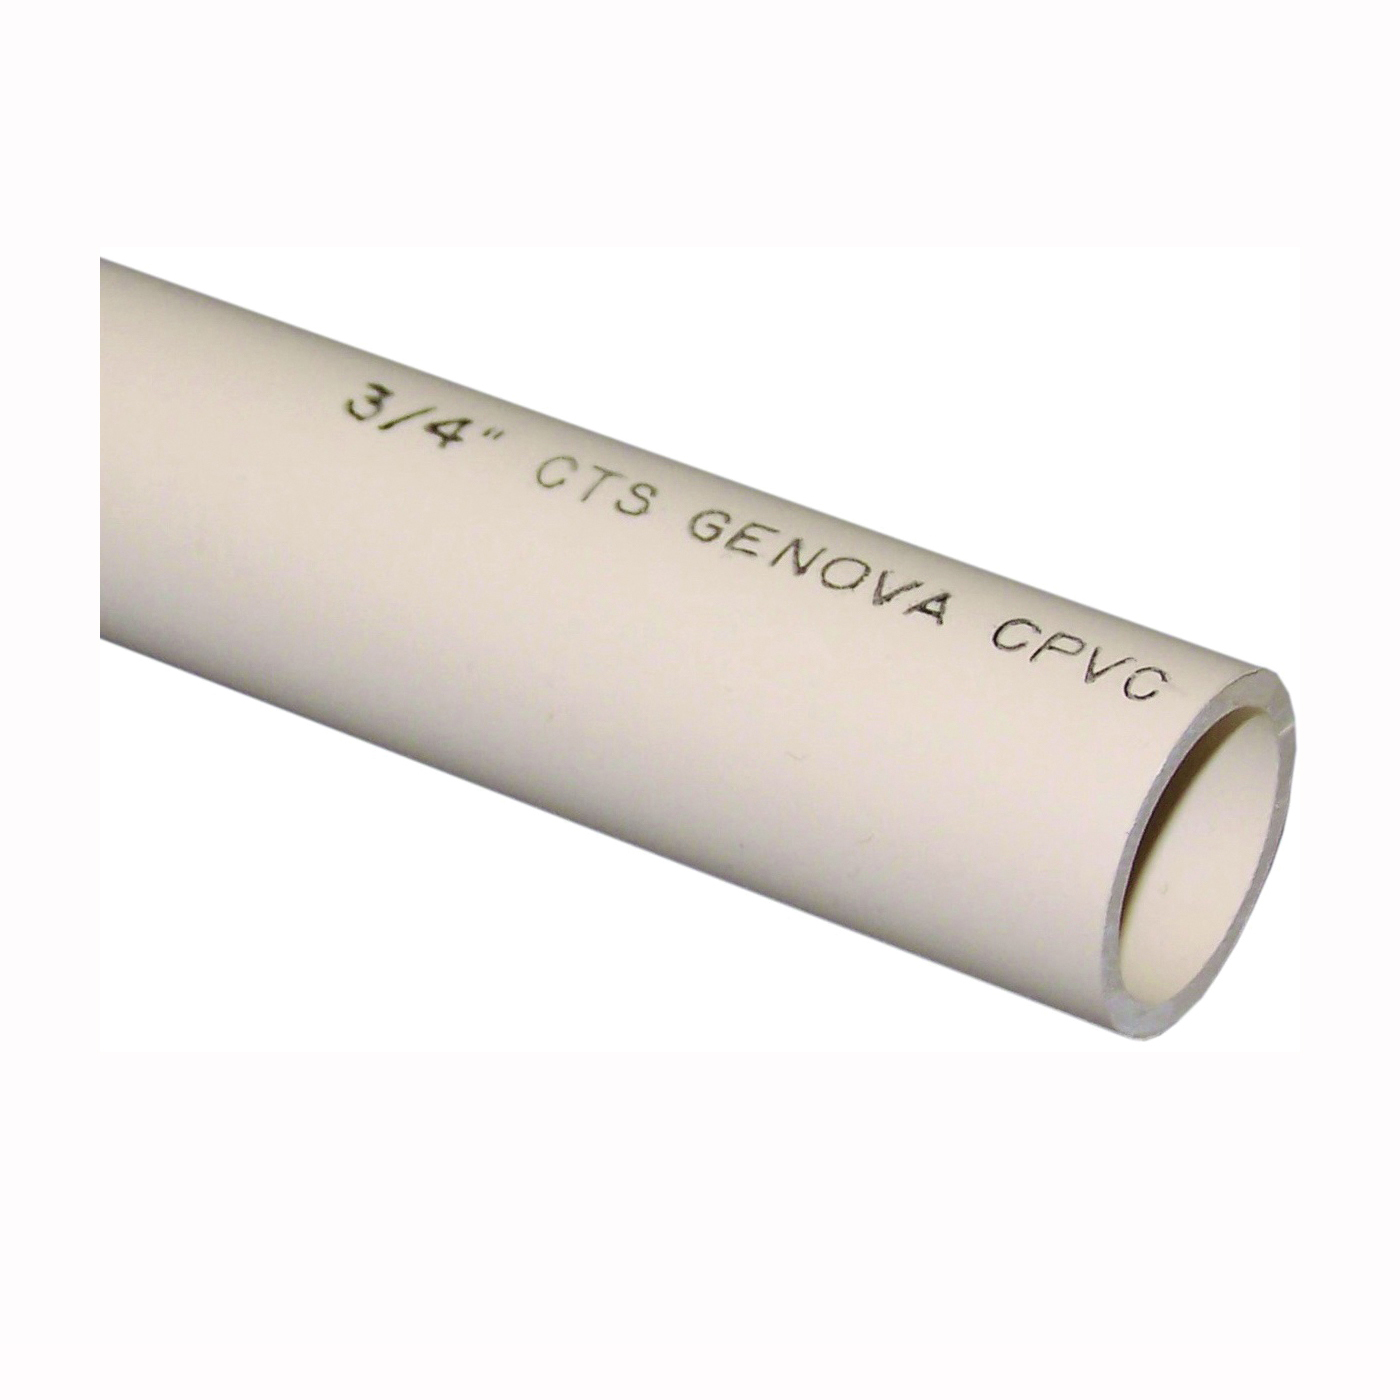 Picture of GENOVA 500072 Cut Pipe, 3/4 in, 2 ft L, Plain